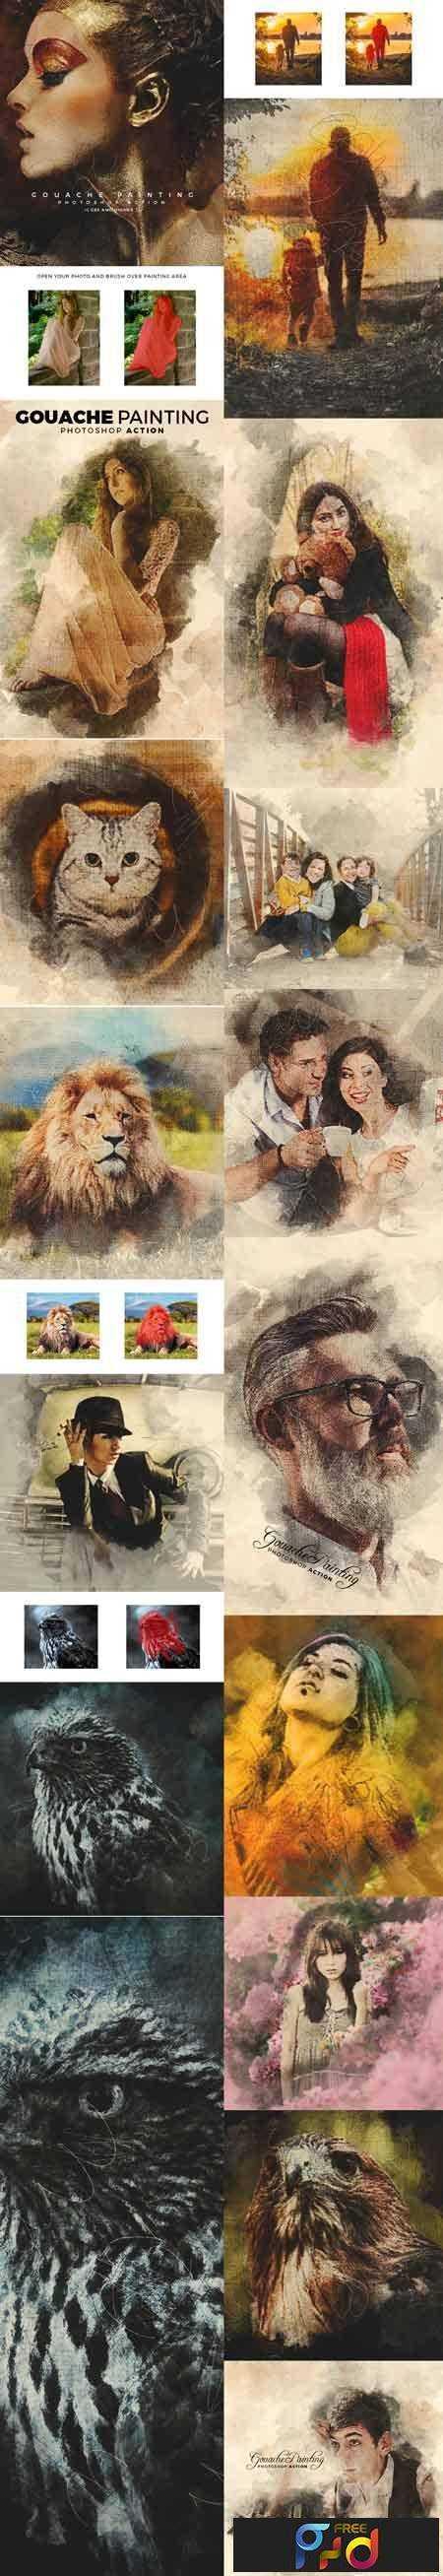 1709135 Gouache Painting 16135141 1